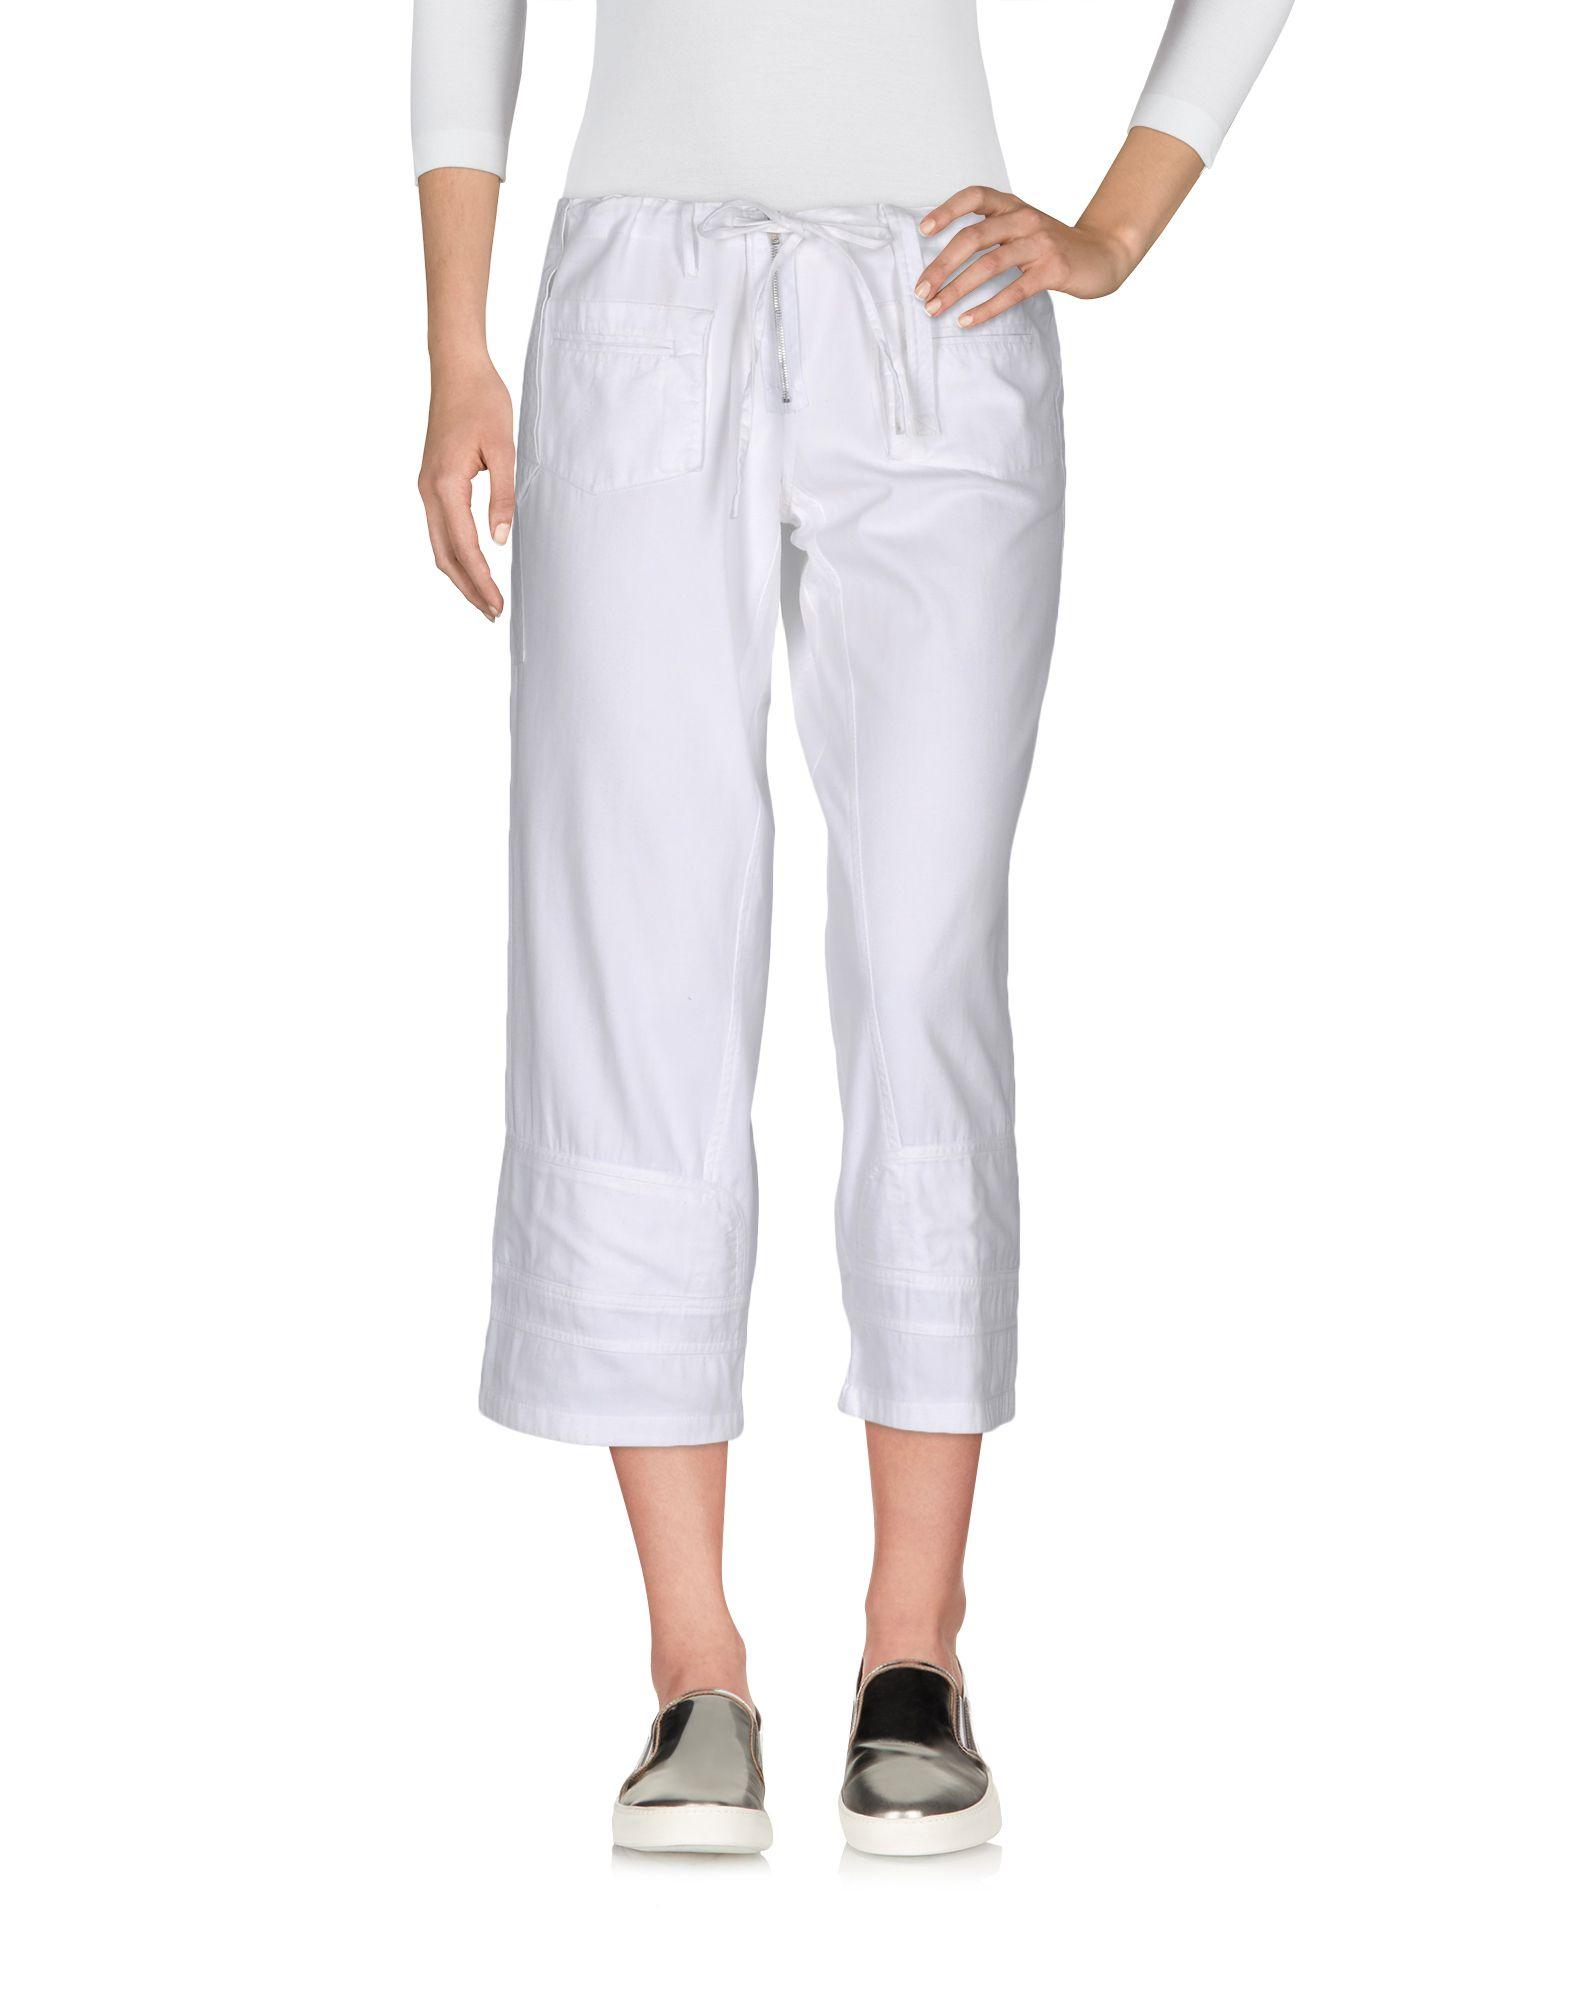 AMERICAN RETRO Denim Pants in White